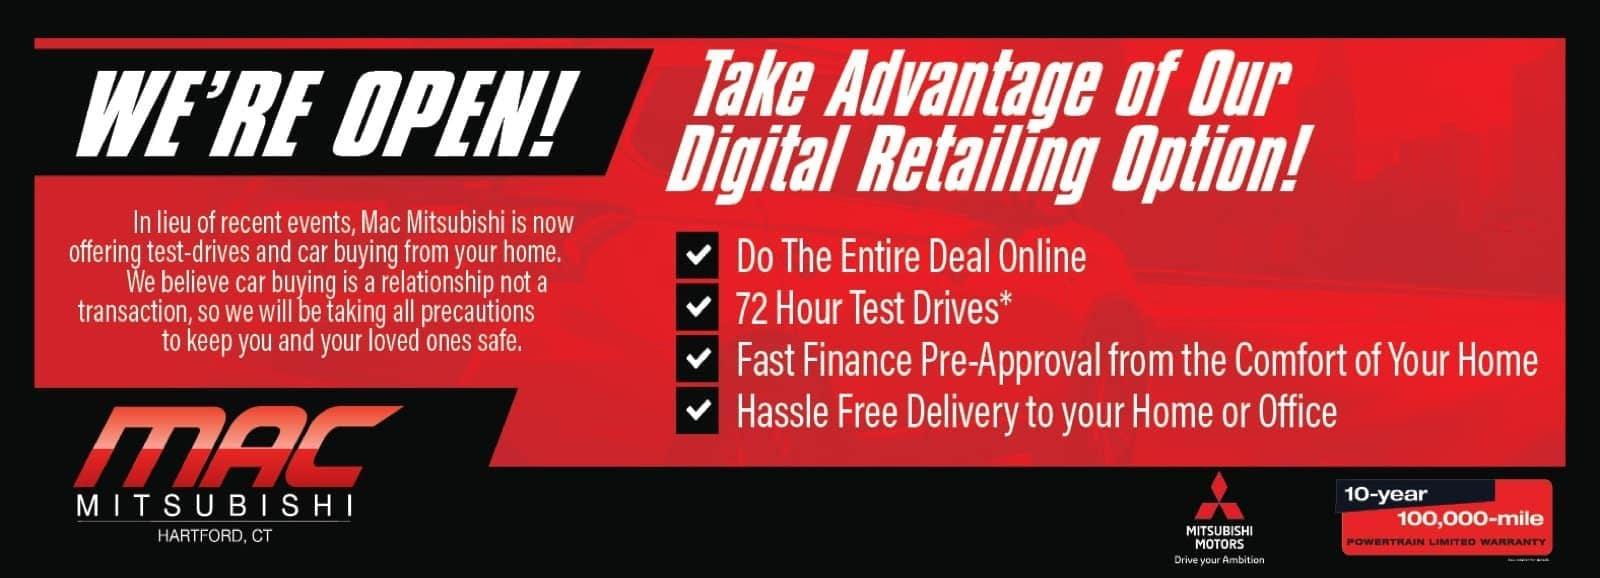 Mac Mitsubishi Digital Retailing banner